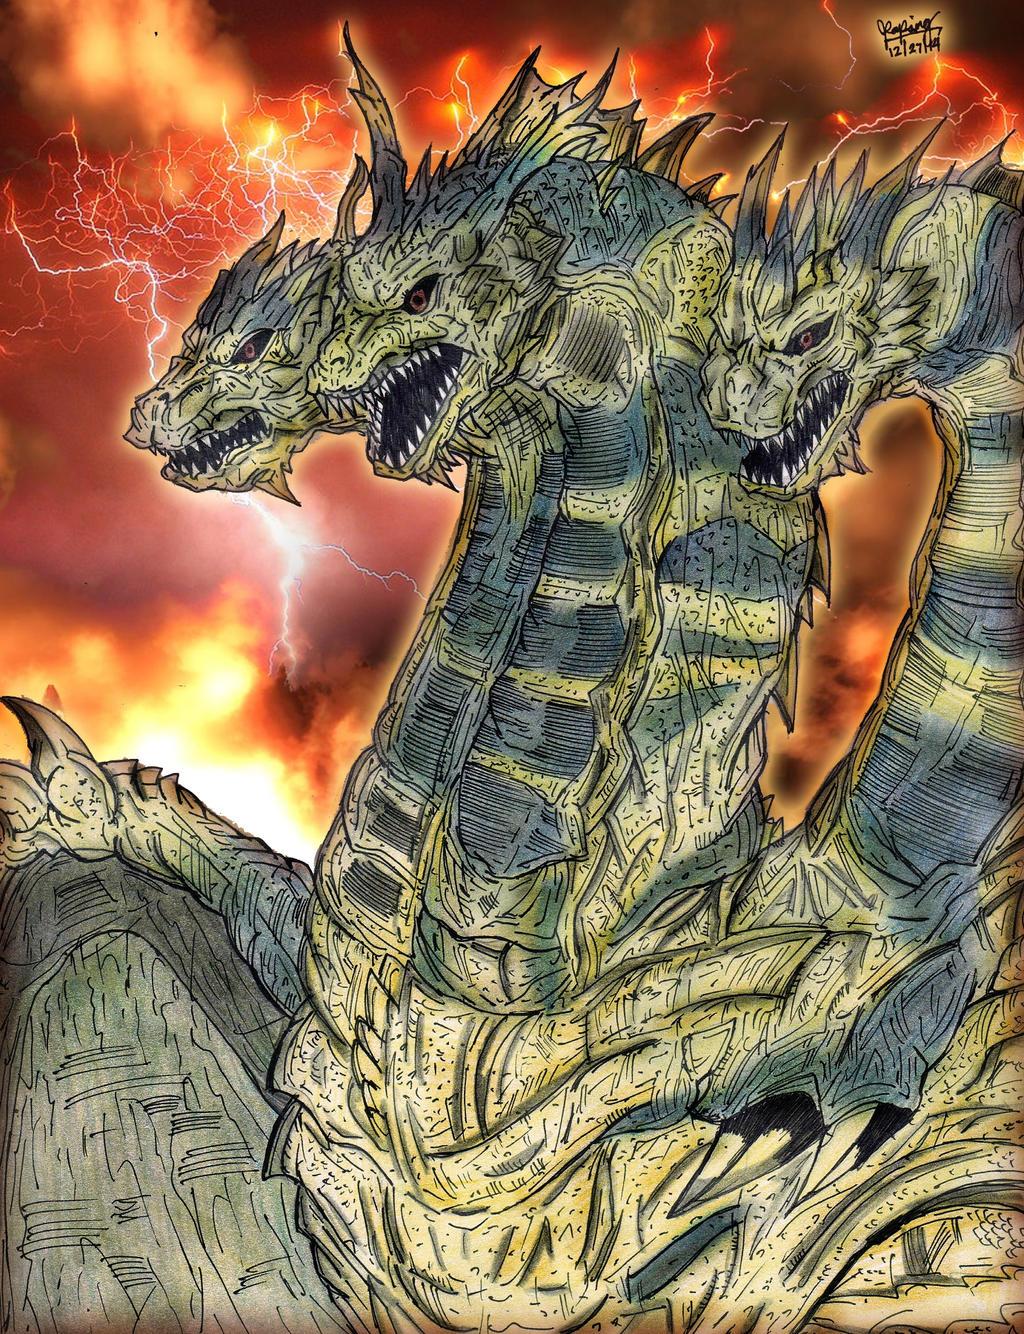 Best Godzilla Movies Of All Time